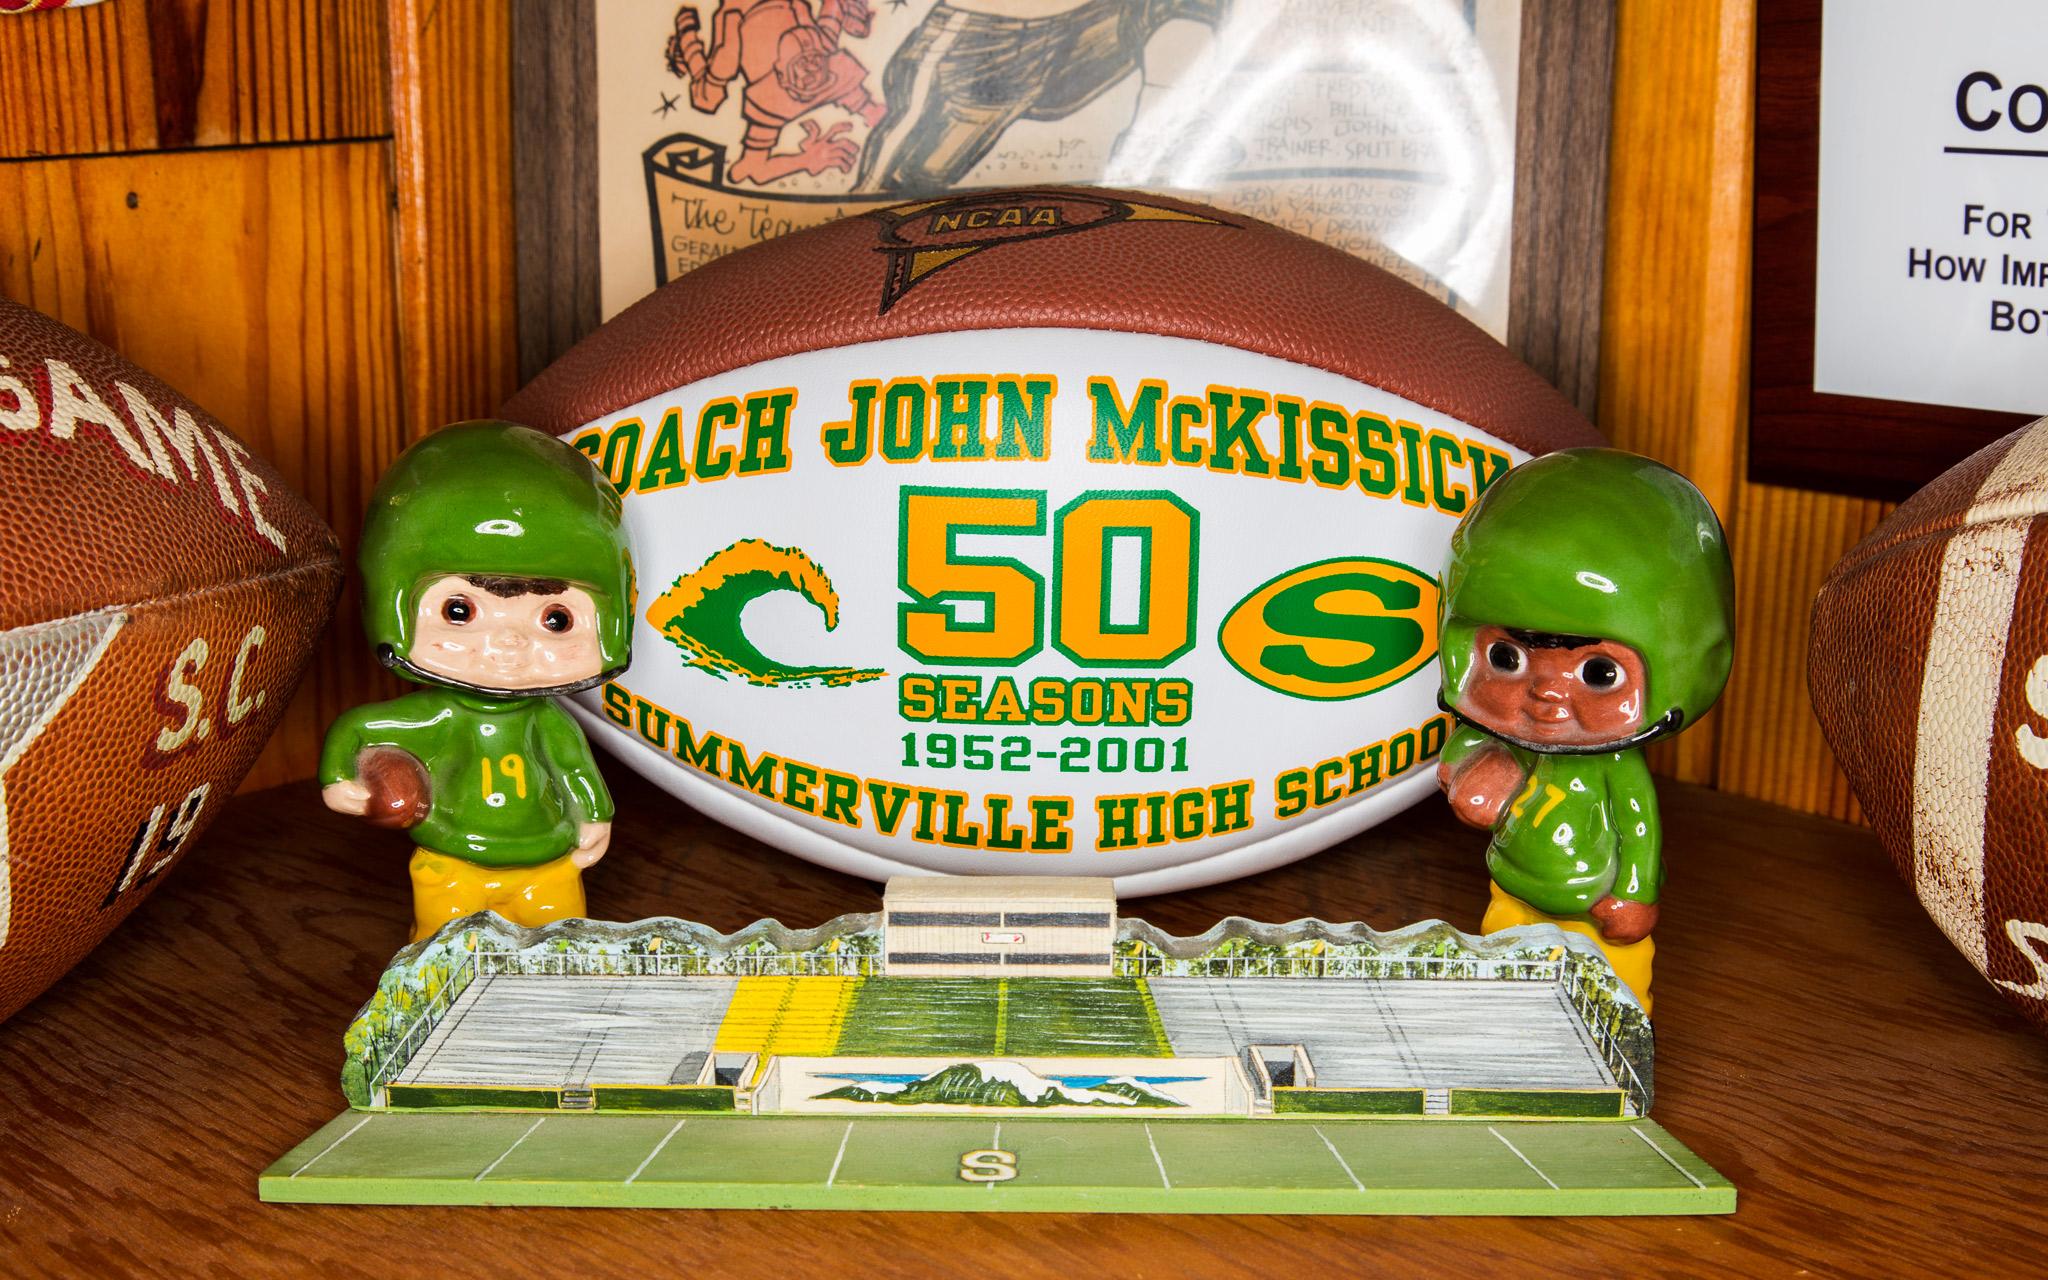 Coach McKissick